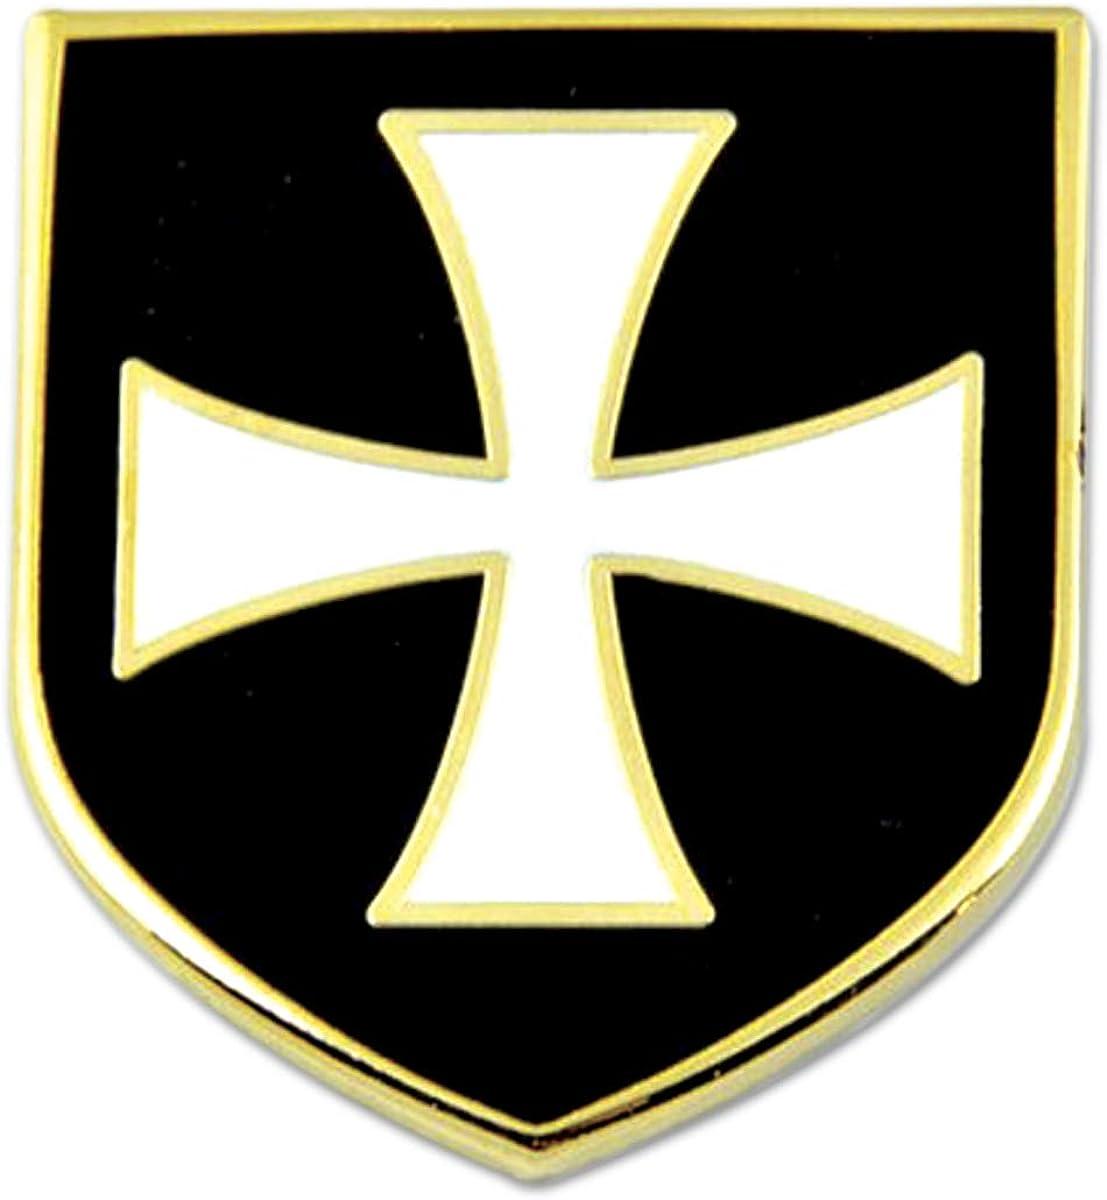 Knights Templar Crusader White Cross Black Shield Masonic Lapel Pin - [Black & White][1'' Tall]